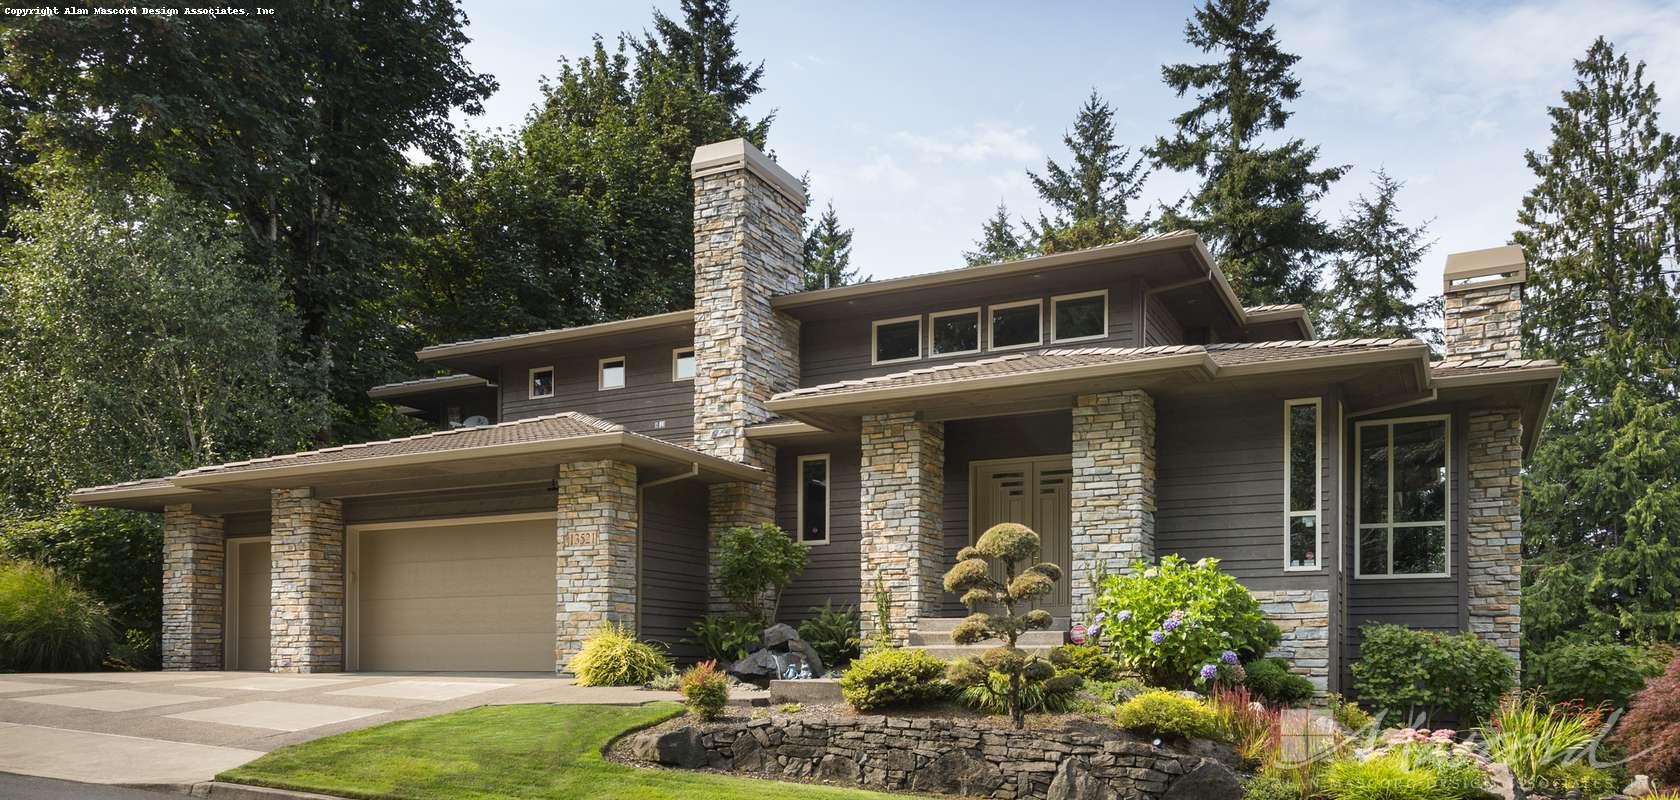 Mascord House Plan 2405: The Maxfield